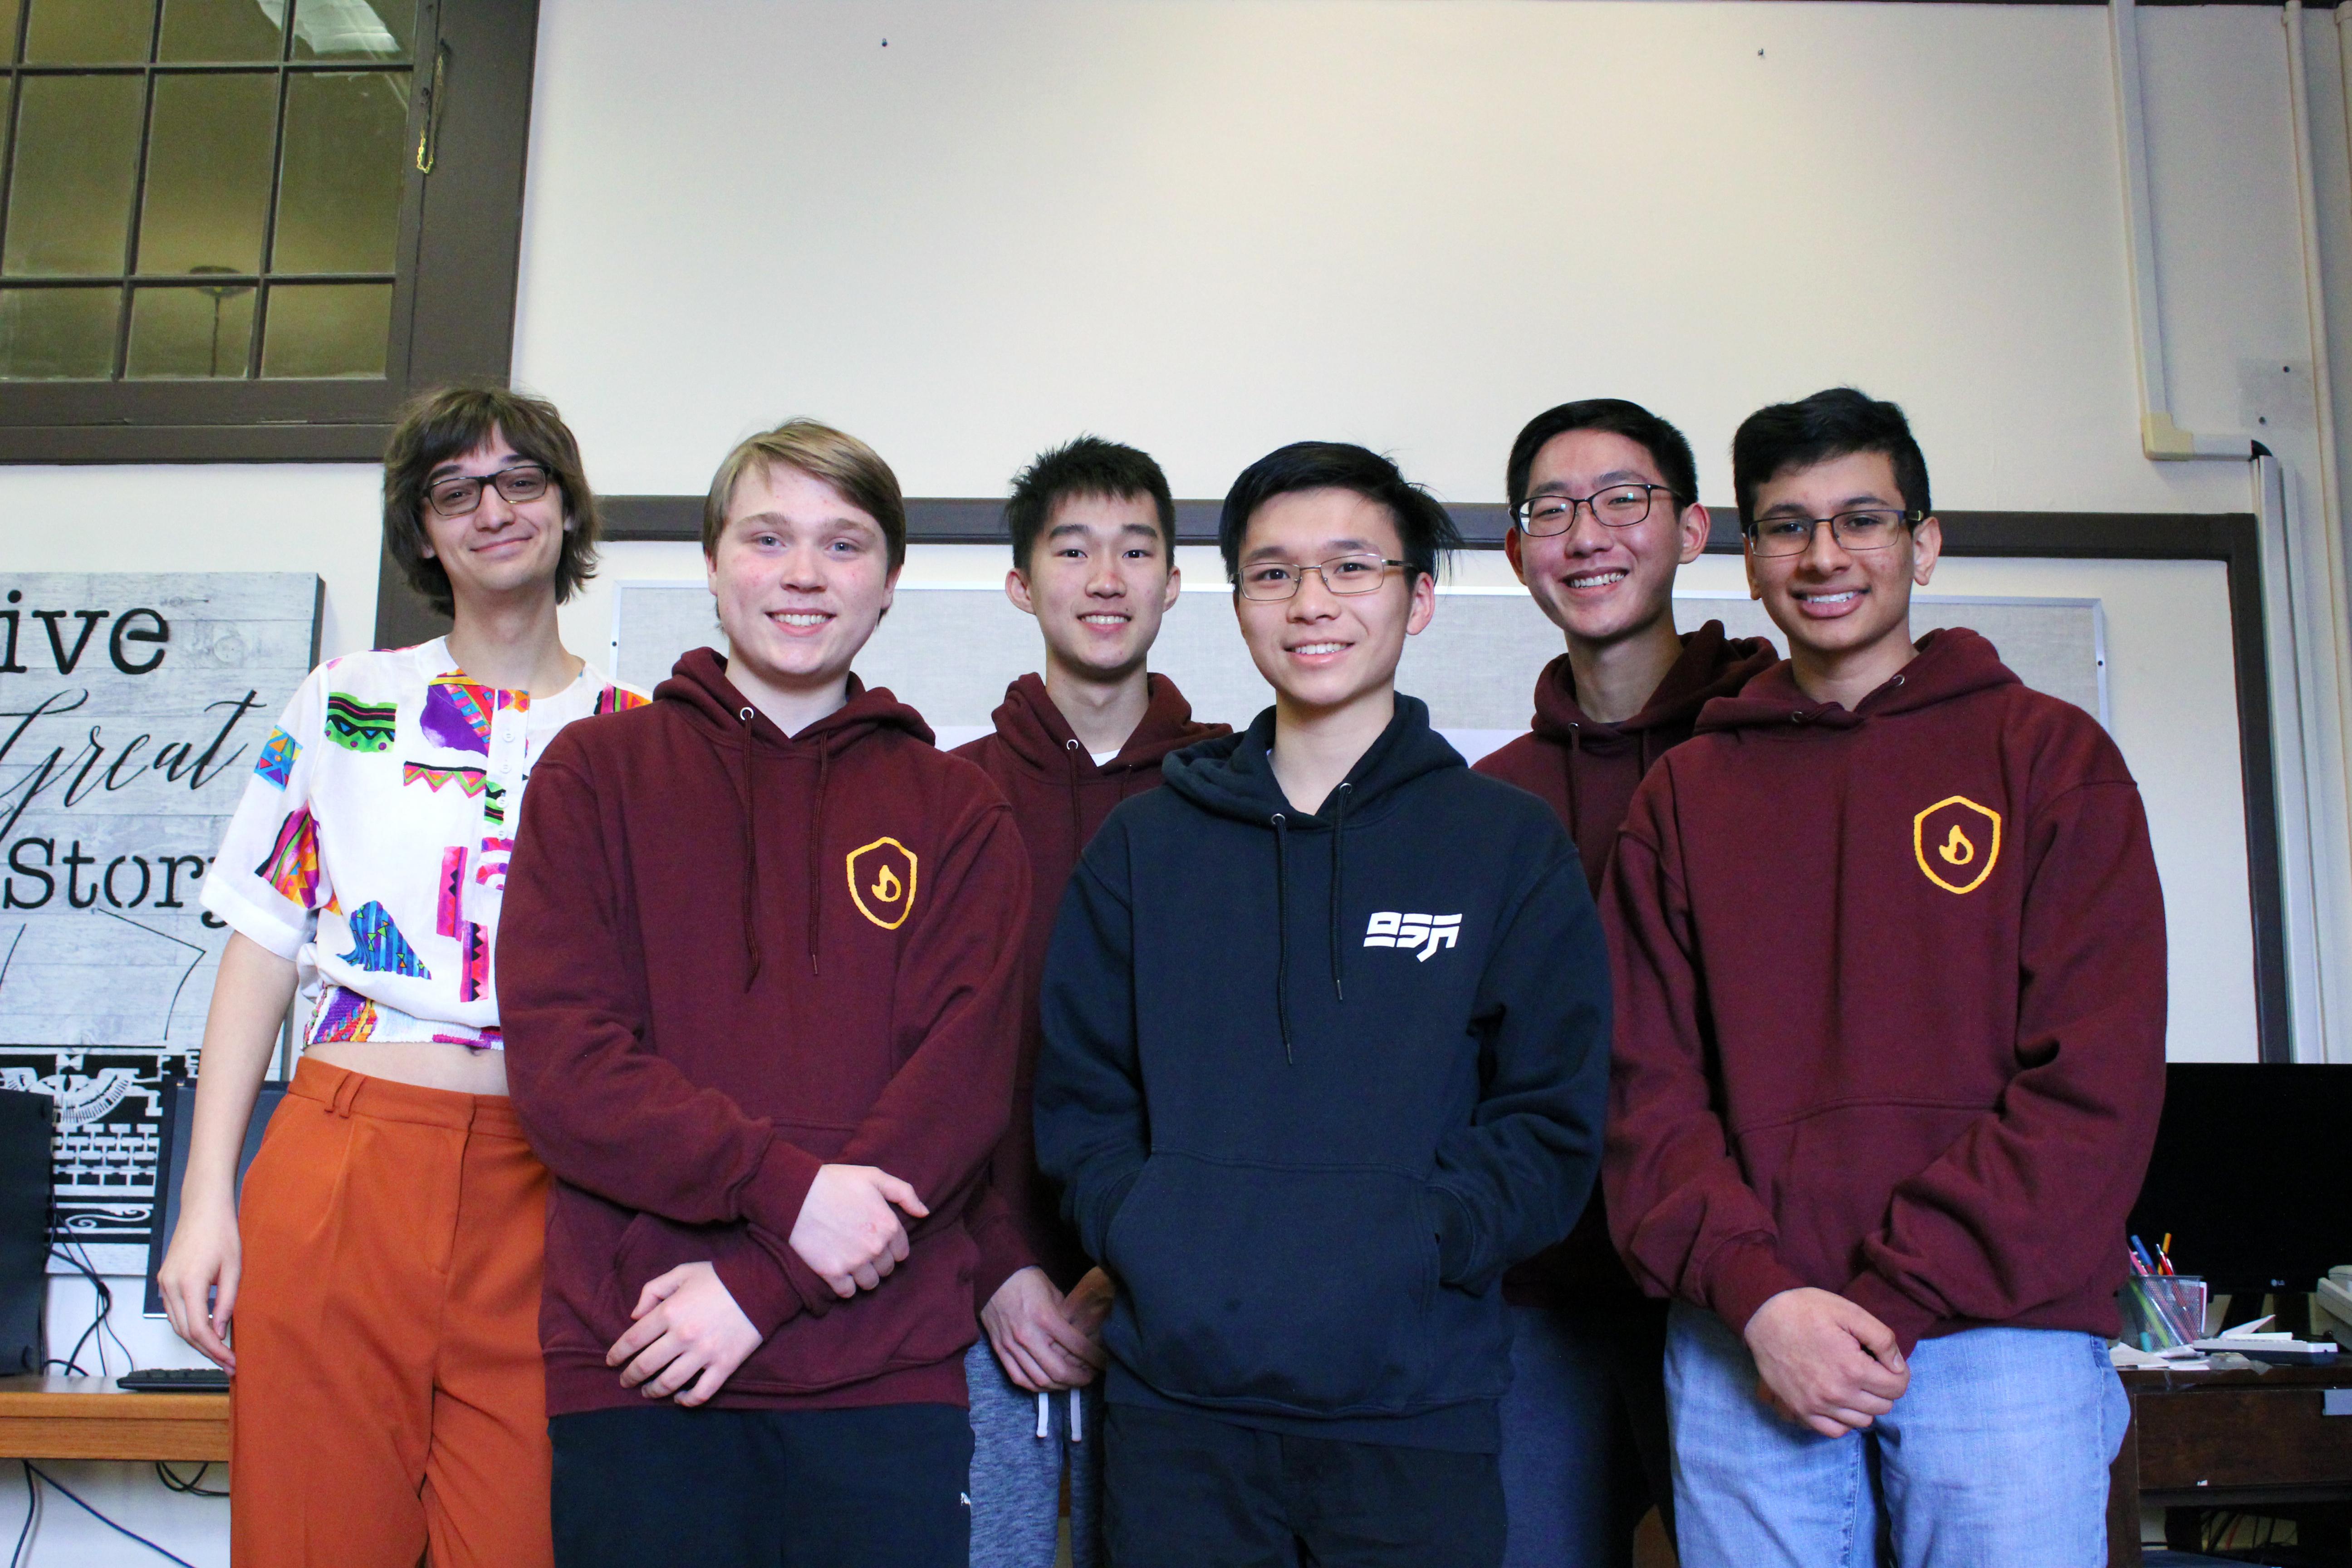 Meet the CyberTitans: Team Maroon